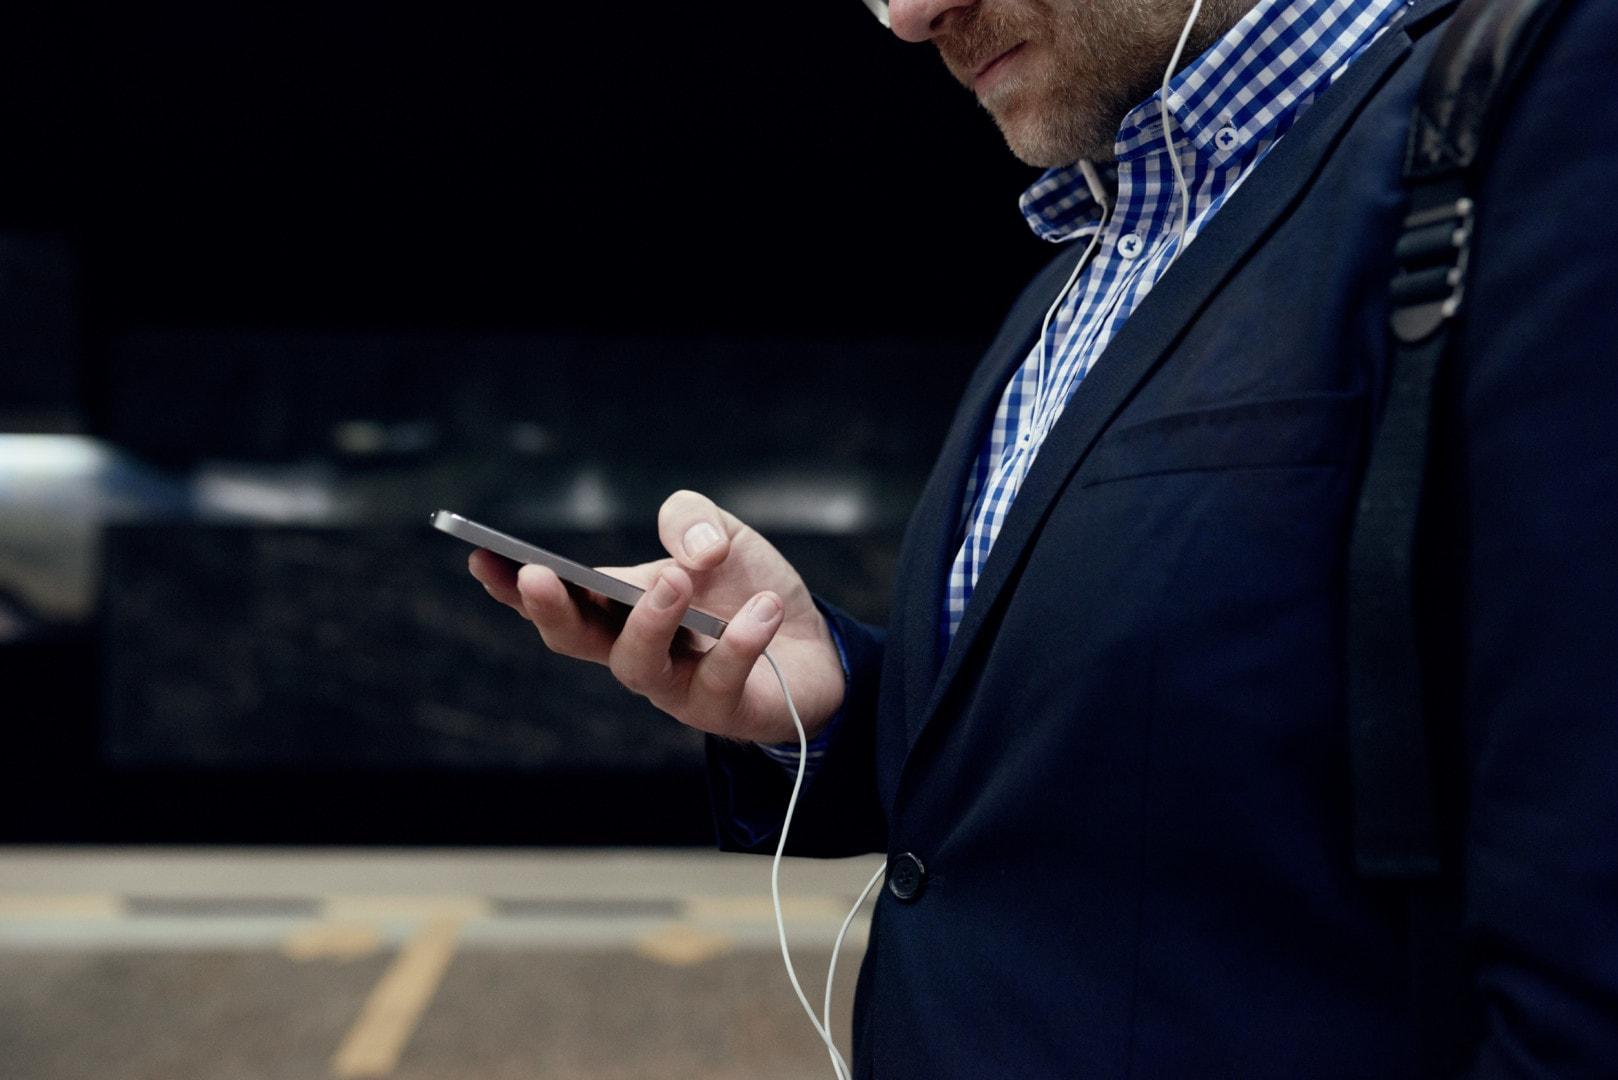 Using Smartphone On Move